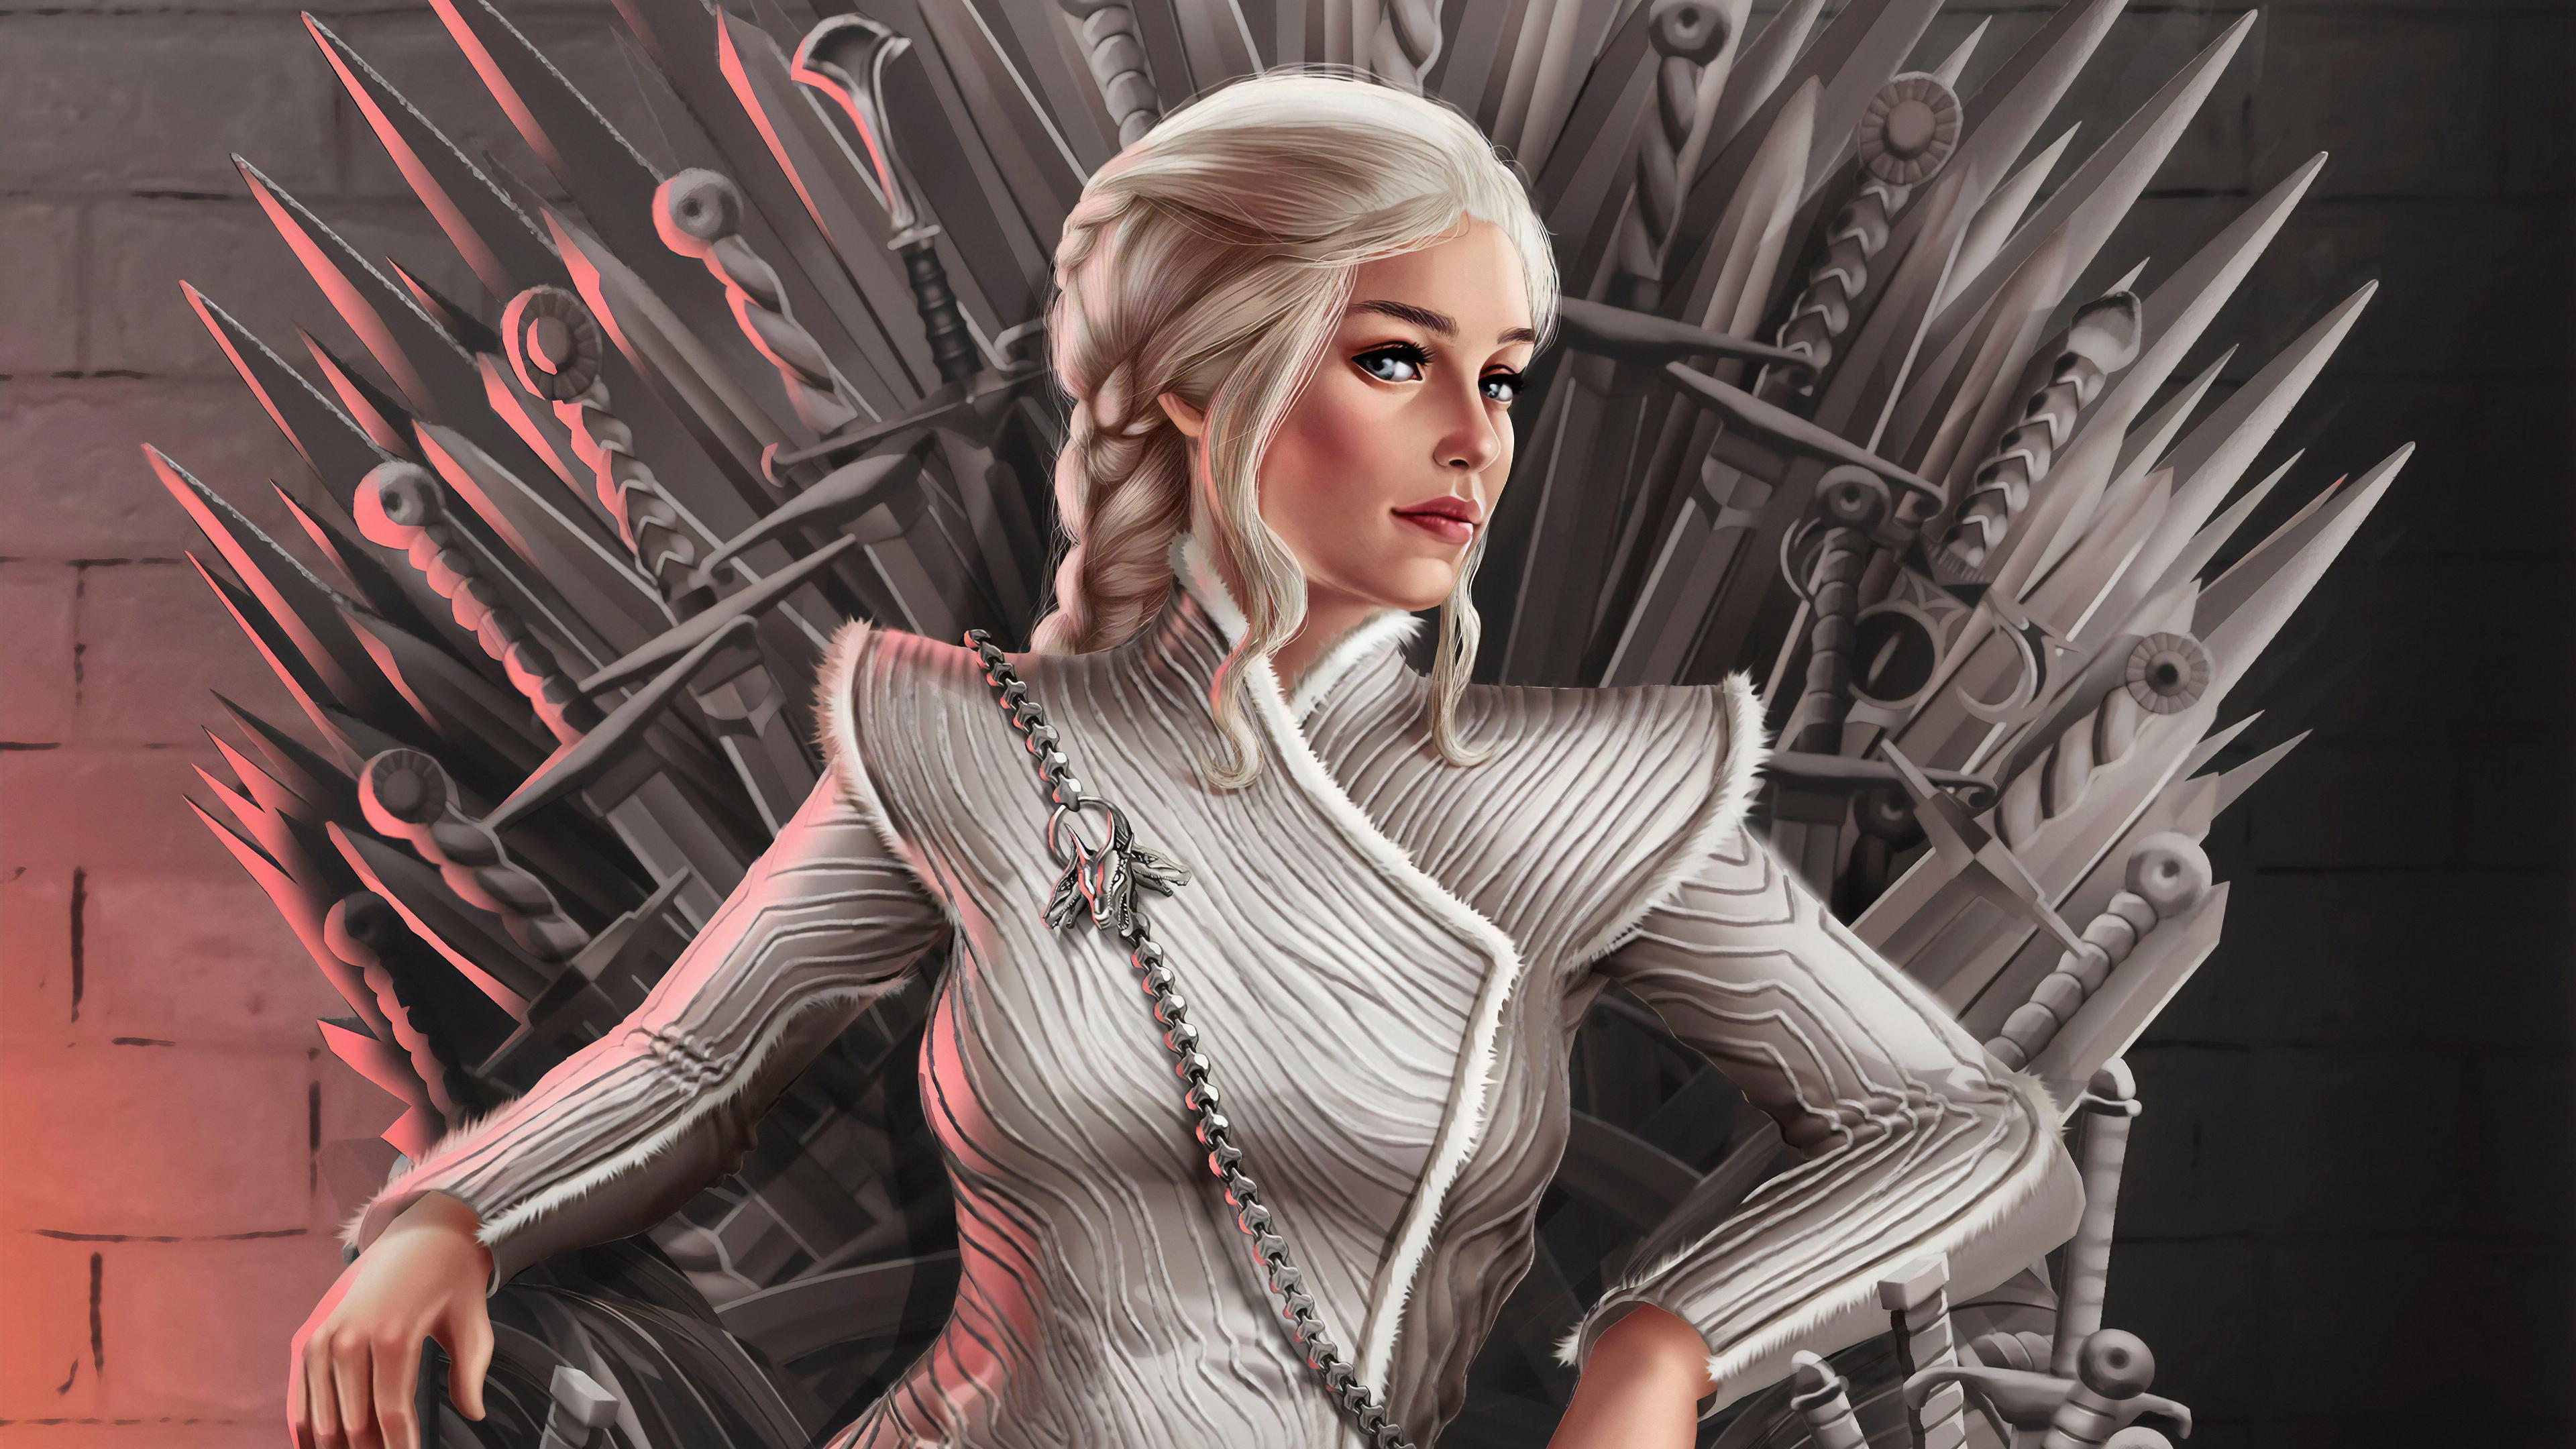 4k Daenerys Targaryen Art Hd Tv Shows 4k Wallpapers